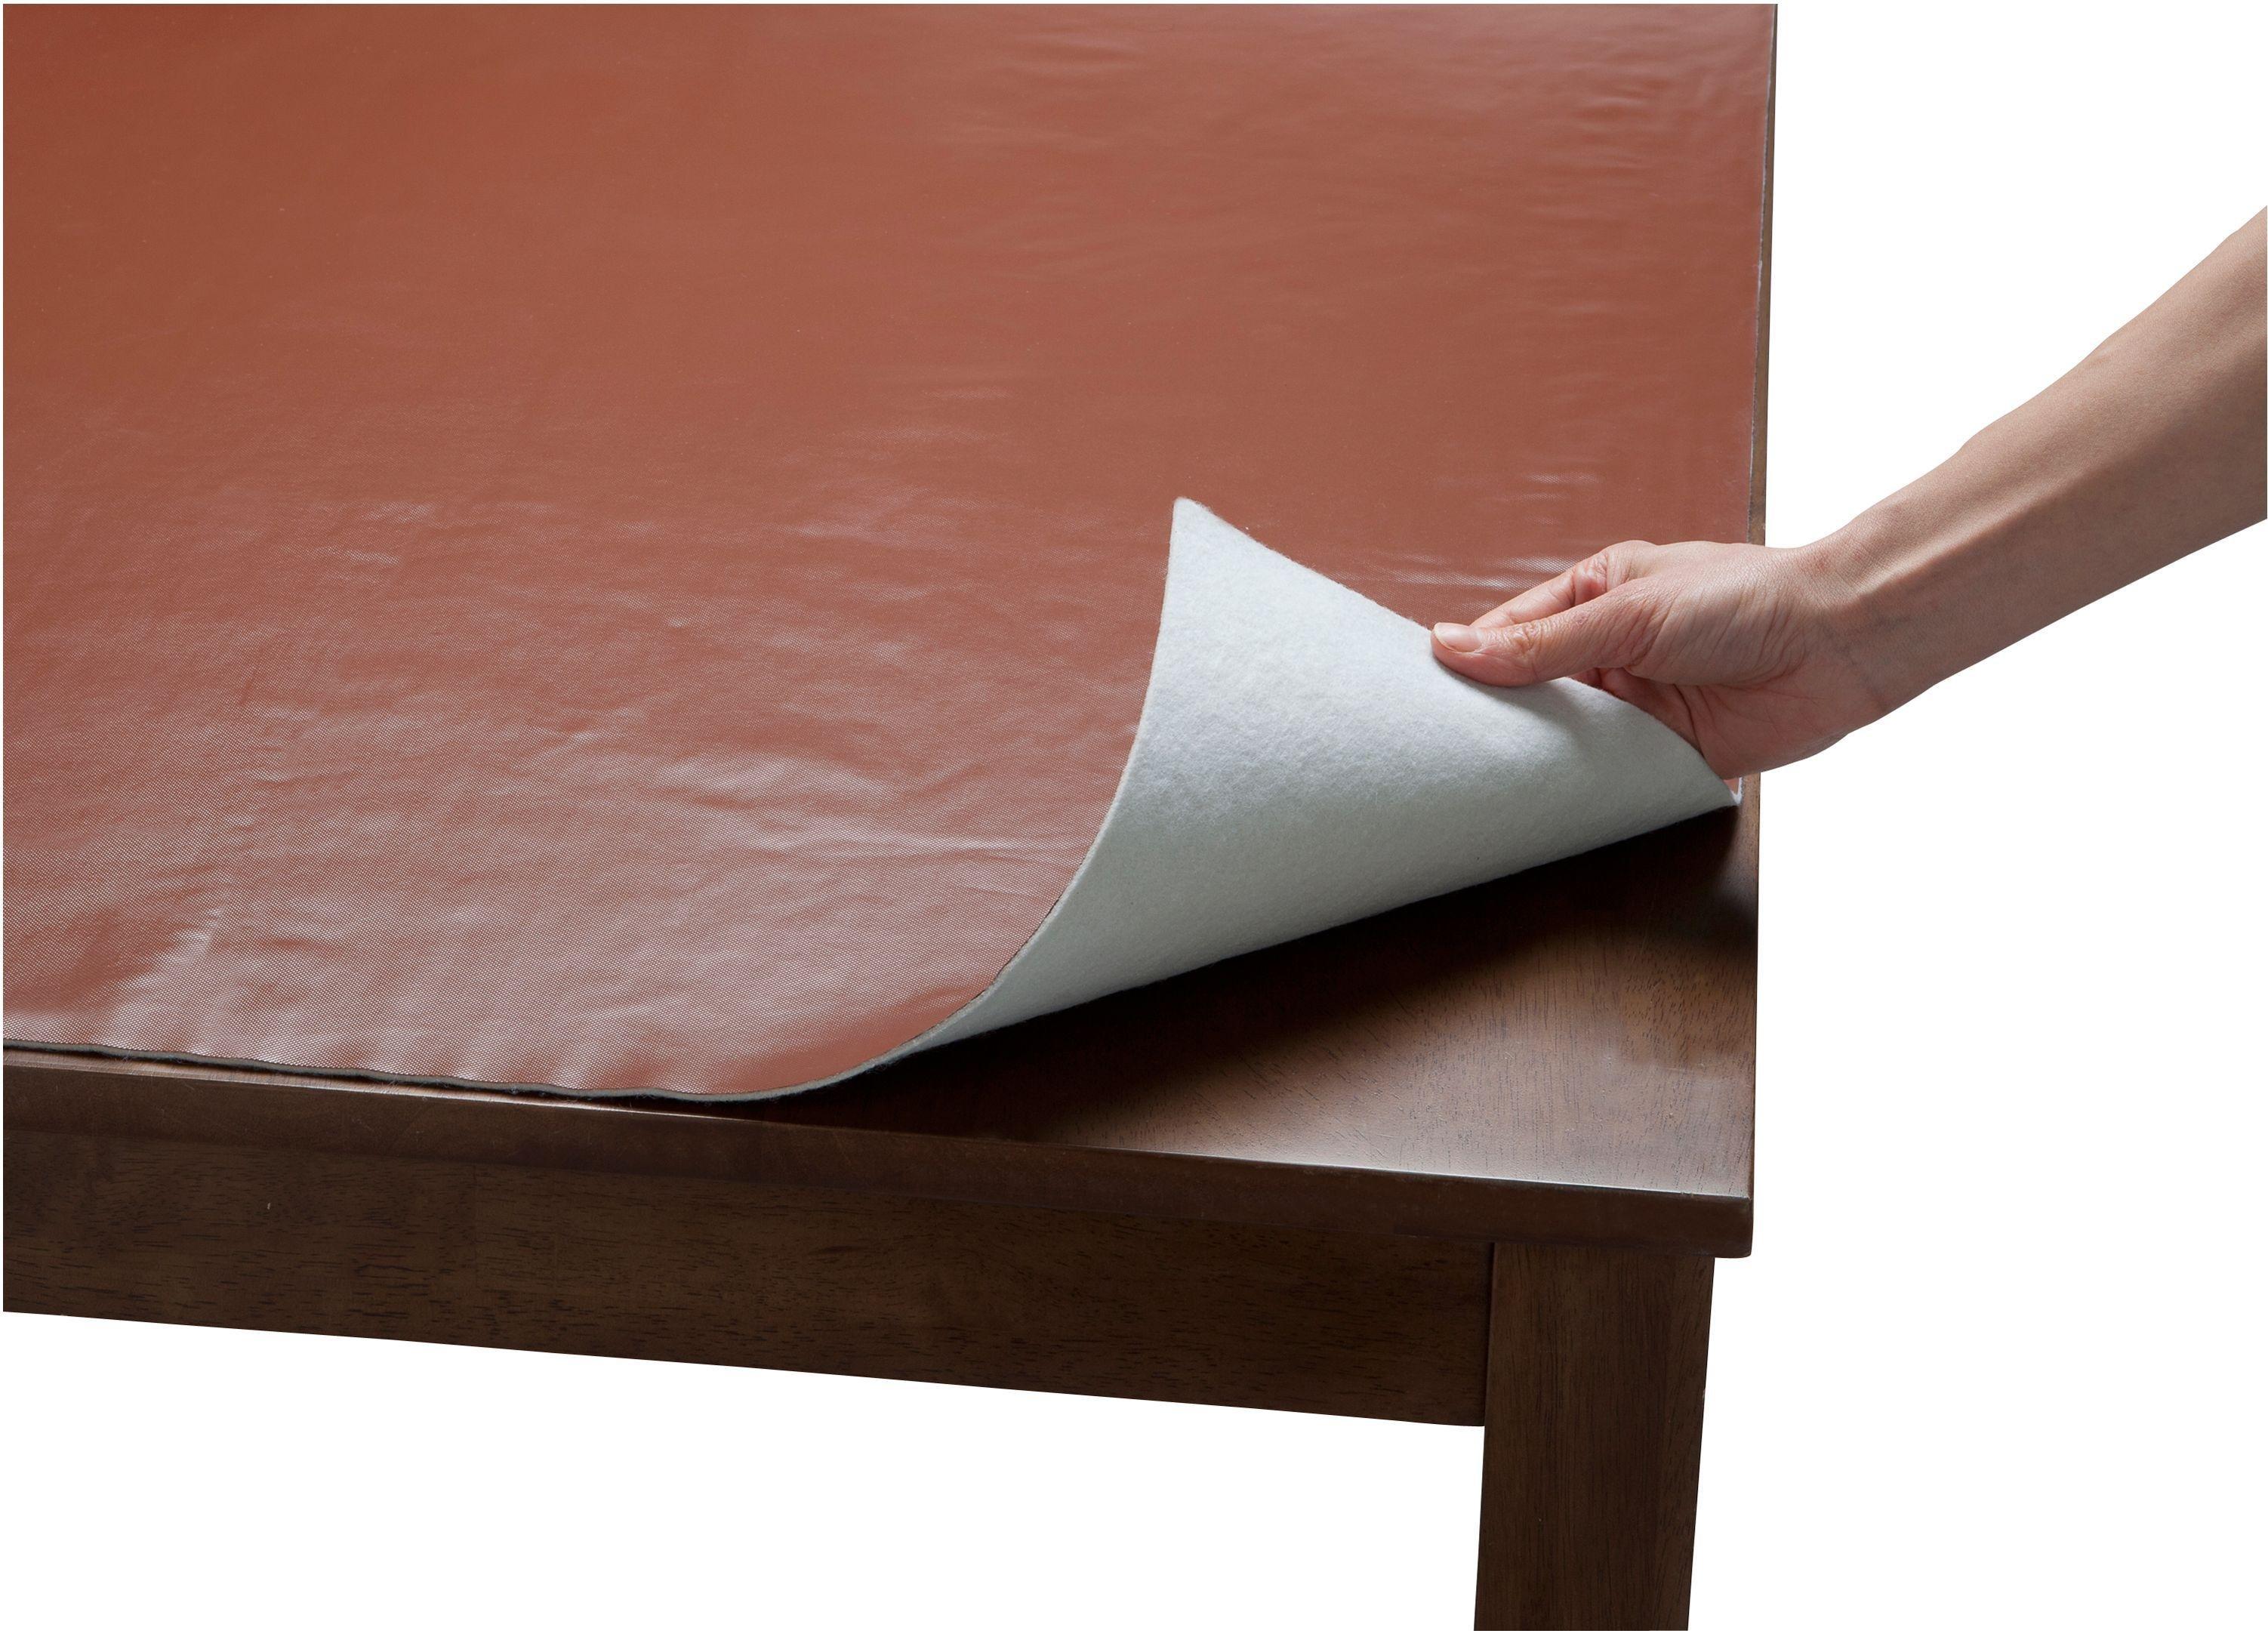 Table Protector Cheap Clear Tablecloth Cover Vinyl Table  : 1220250RZ001AUC1168189Webu0026wu003d570u0026hu003d513 from www.alkotshnews.com size 3004 x 2184 jpeg 610kB